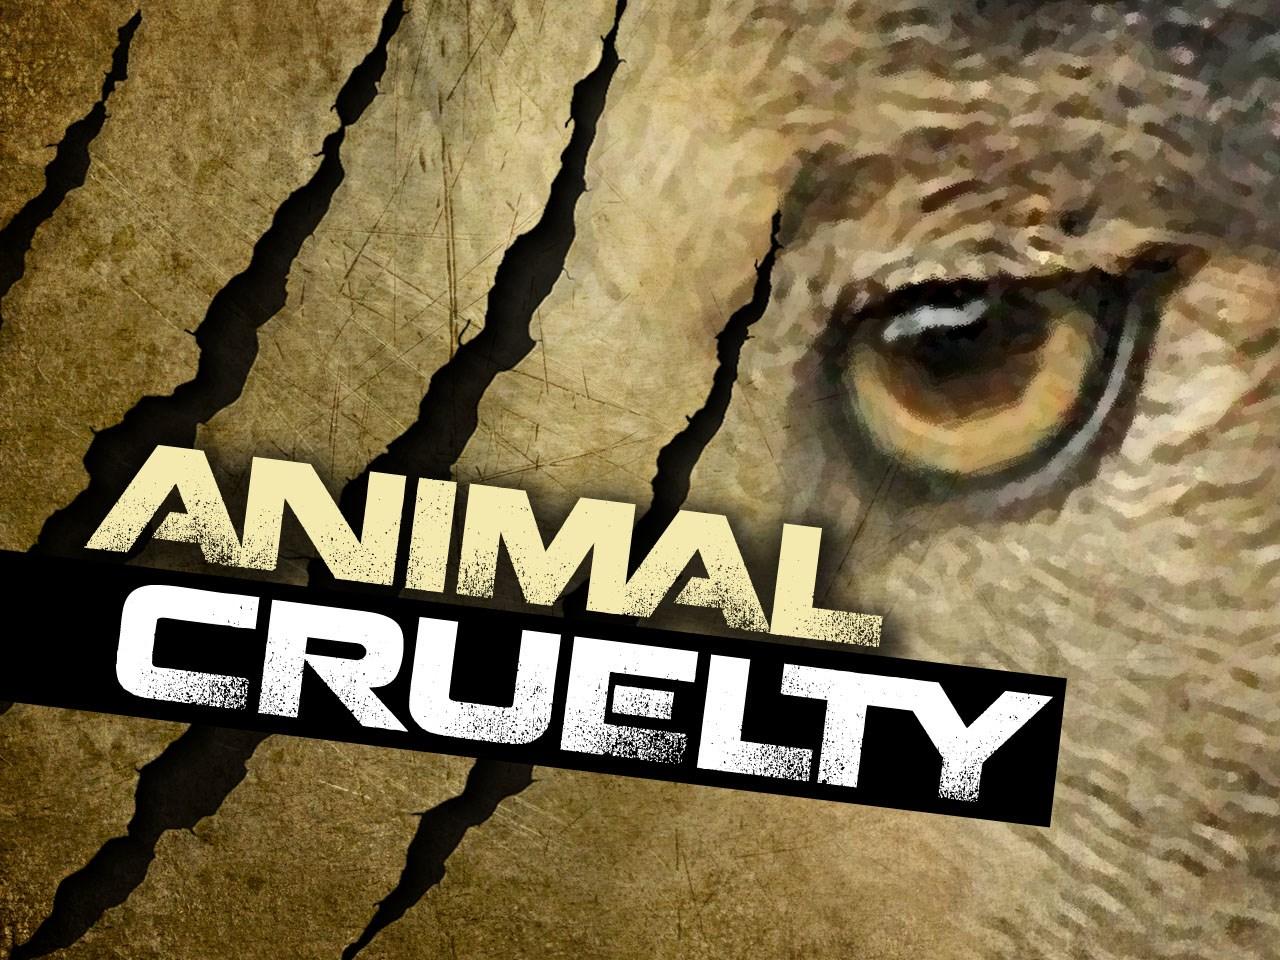 ANIMAL CRUELTY_1453221298004.jpg